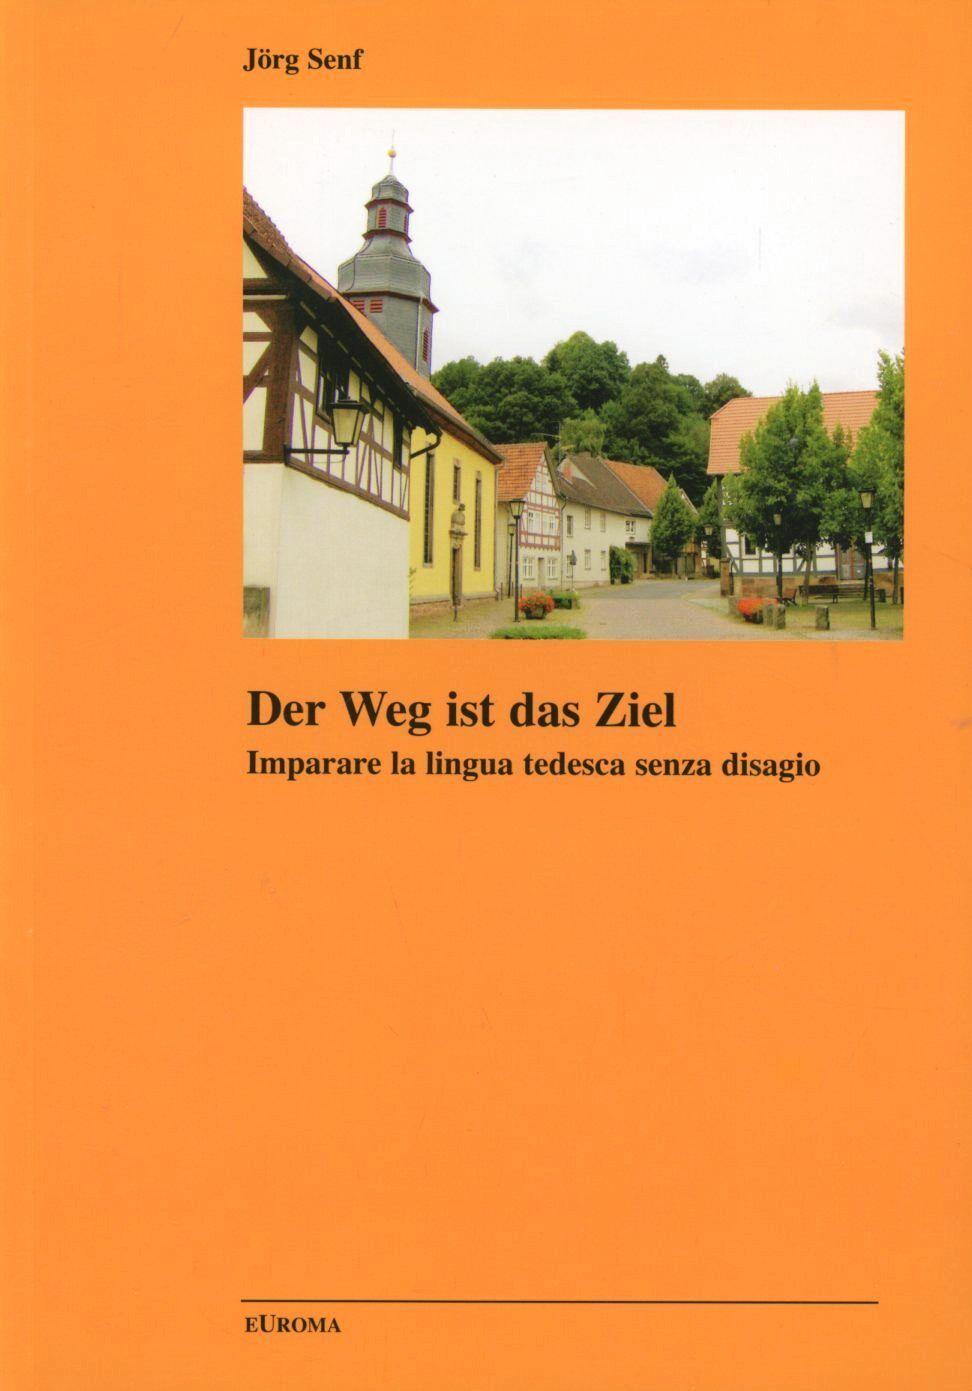 Der Weg ist das Ziel. Suggerimenti e esercizi sulla lingua tedesca. Ediz. italiana e tedesca